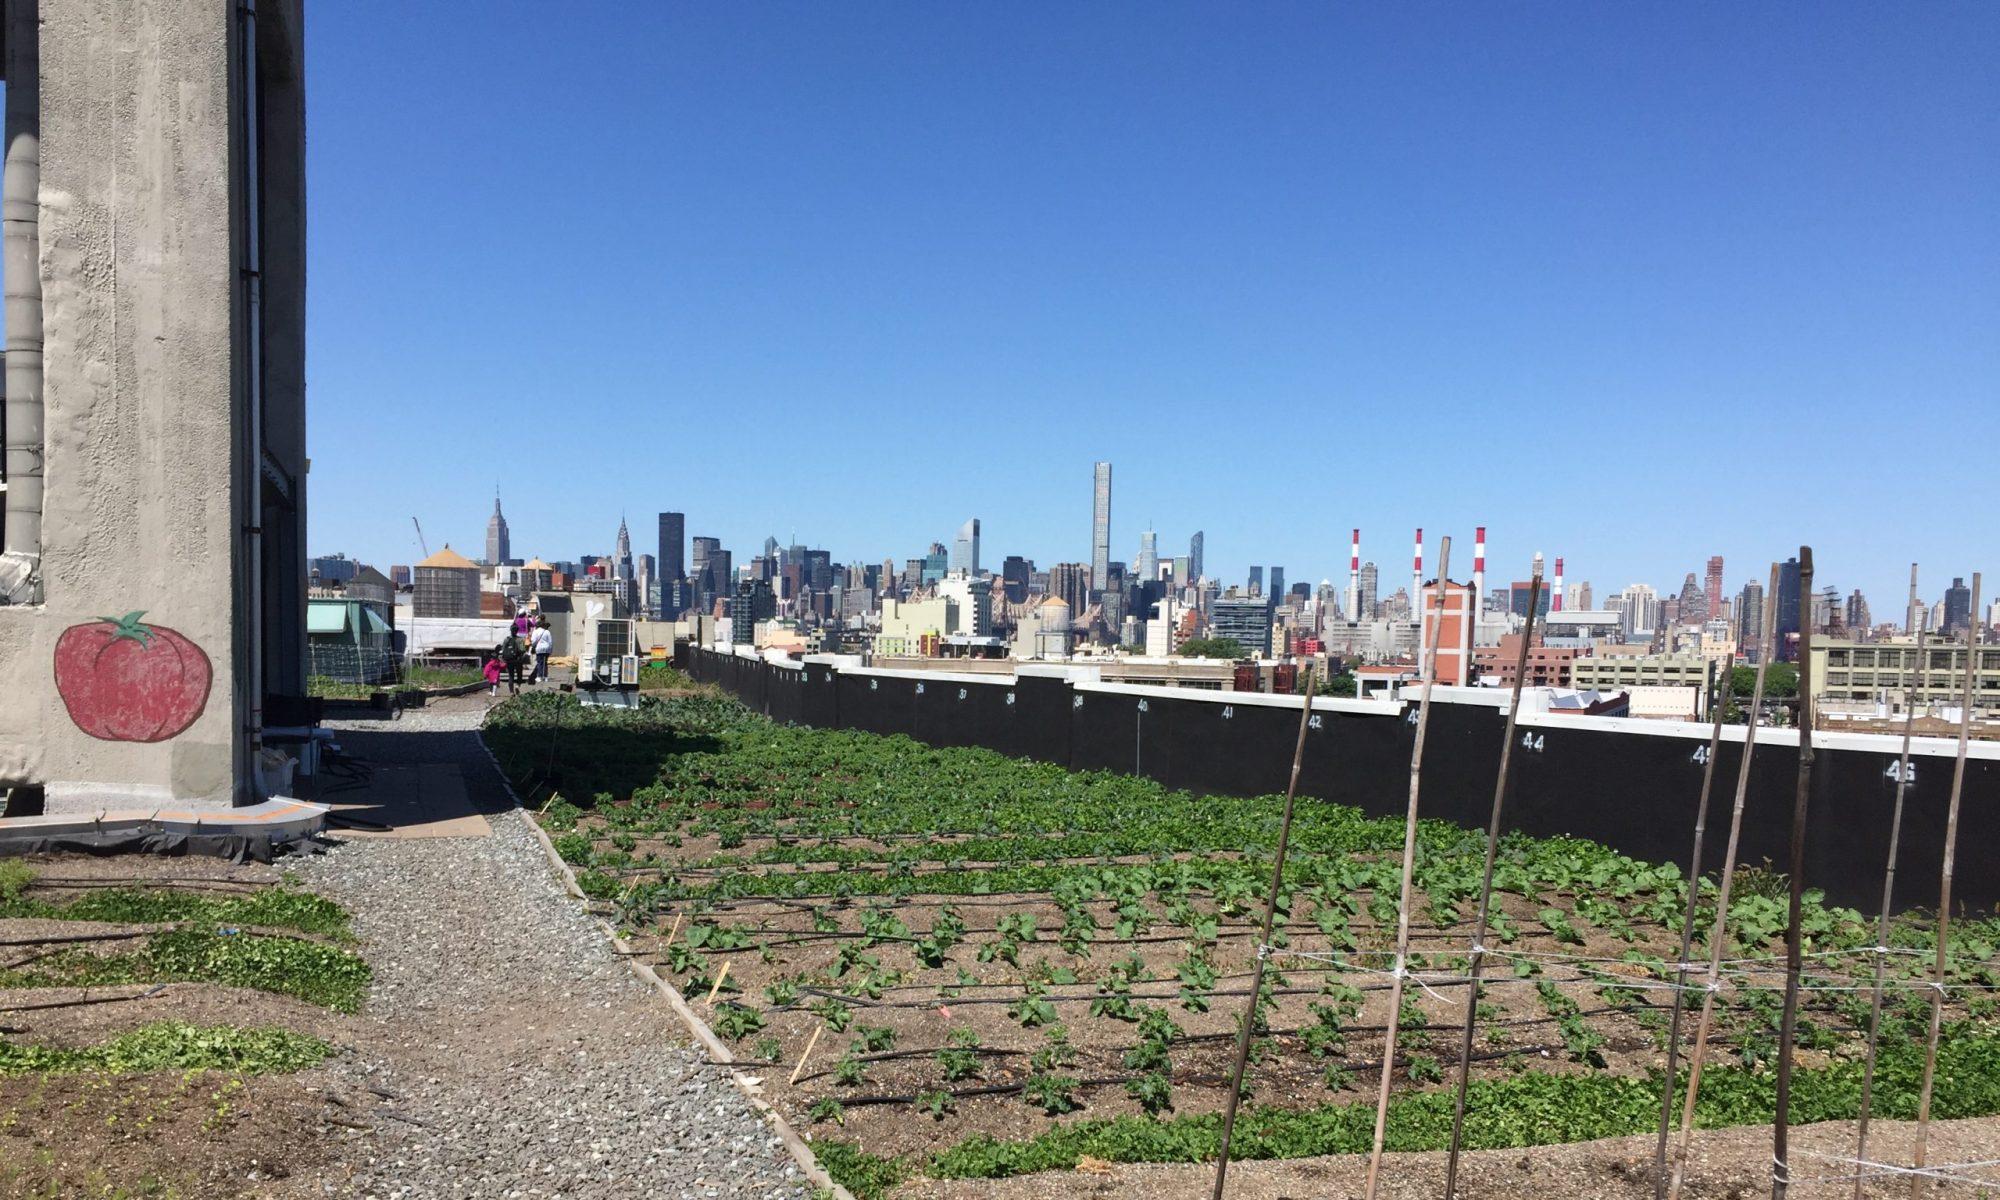 Salford Care and Urban Farm Hub